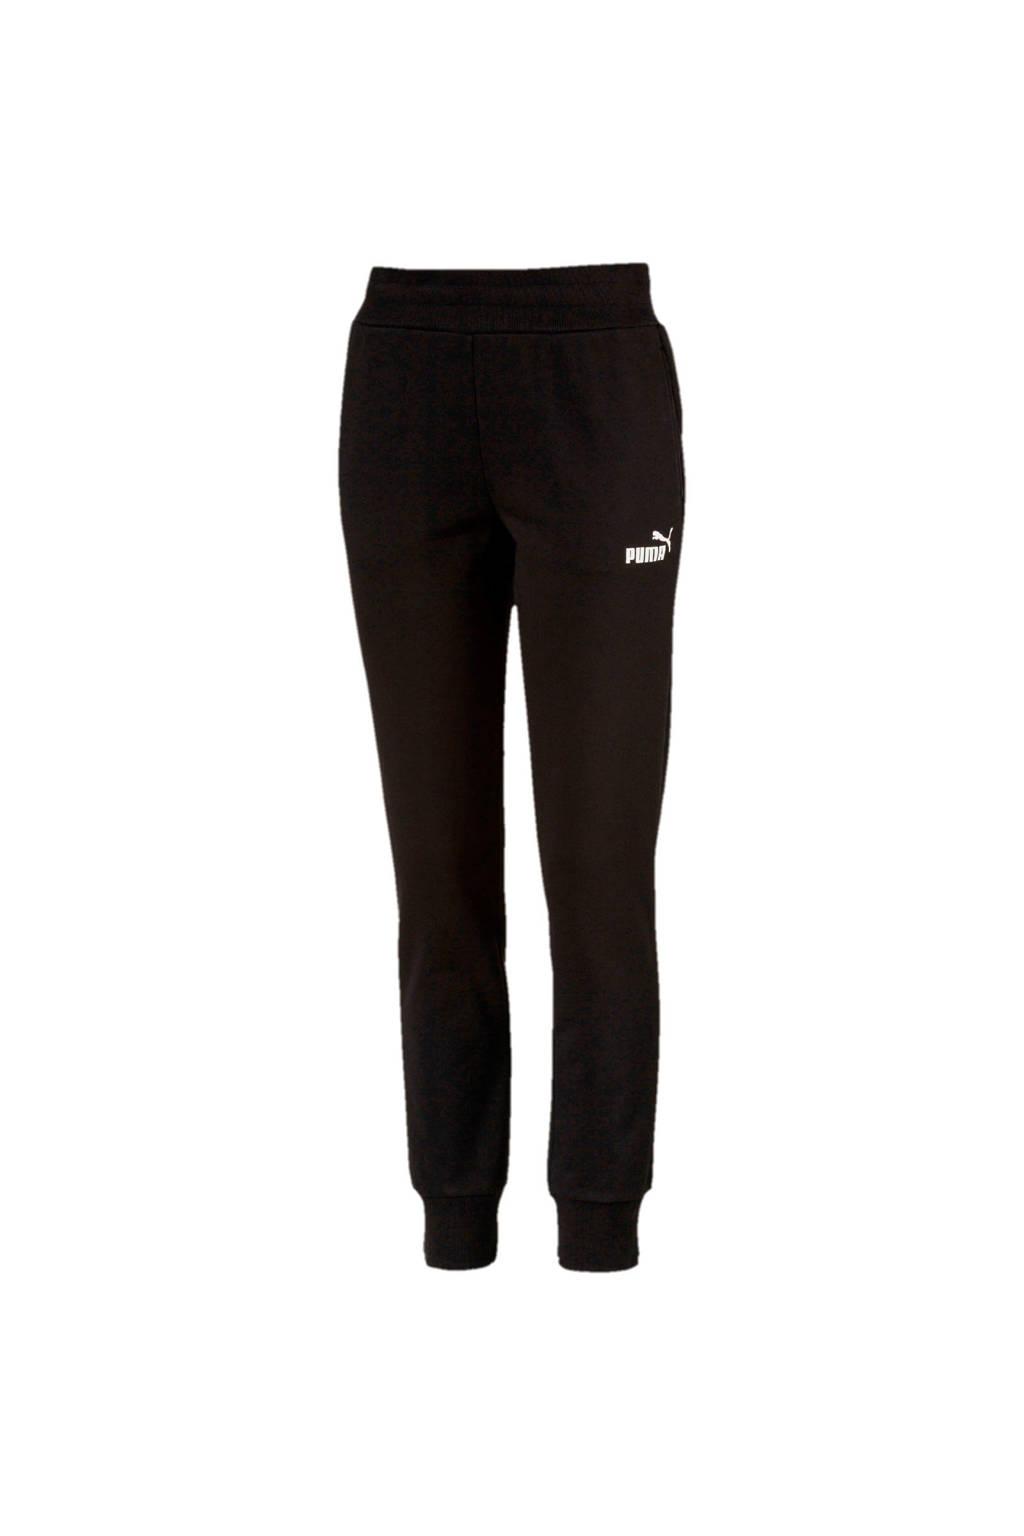 Puma joggingbroek zwart, Zwart